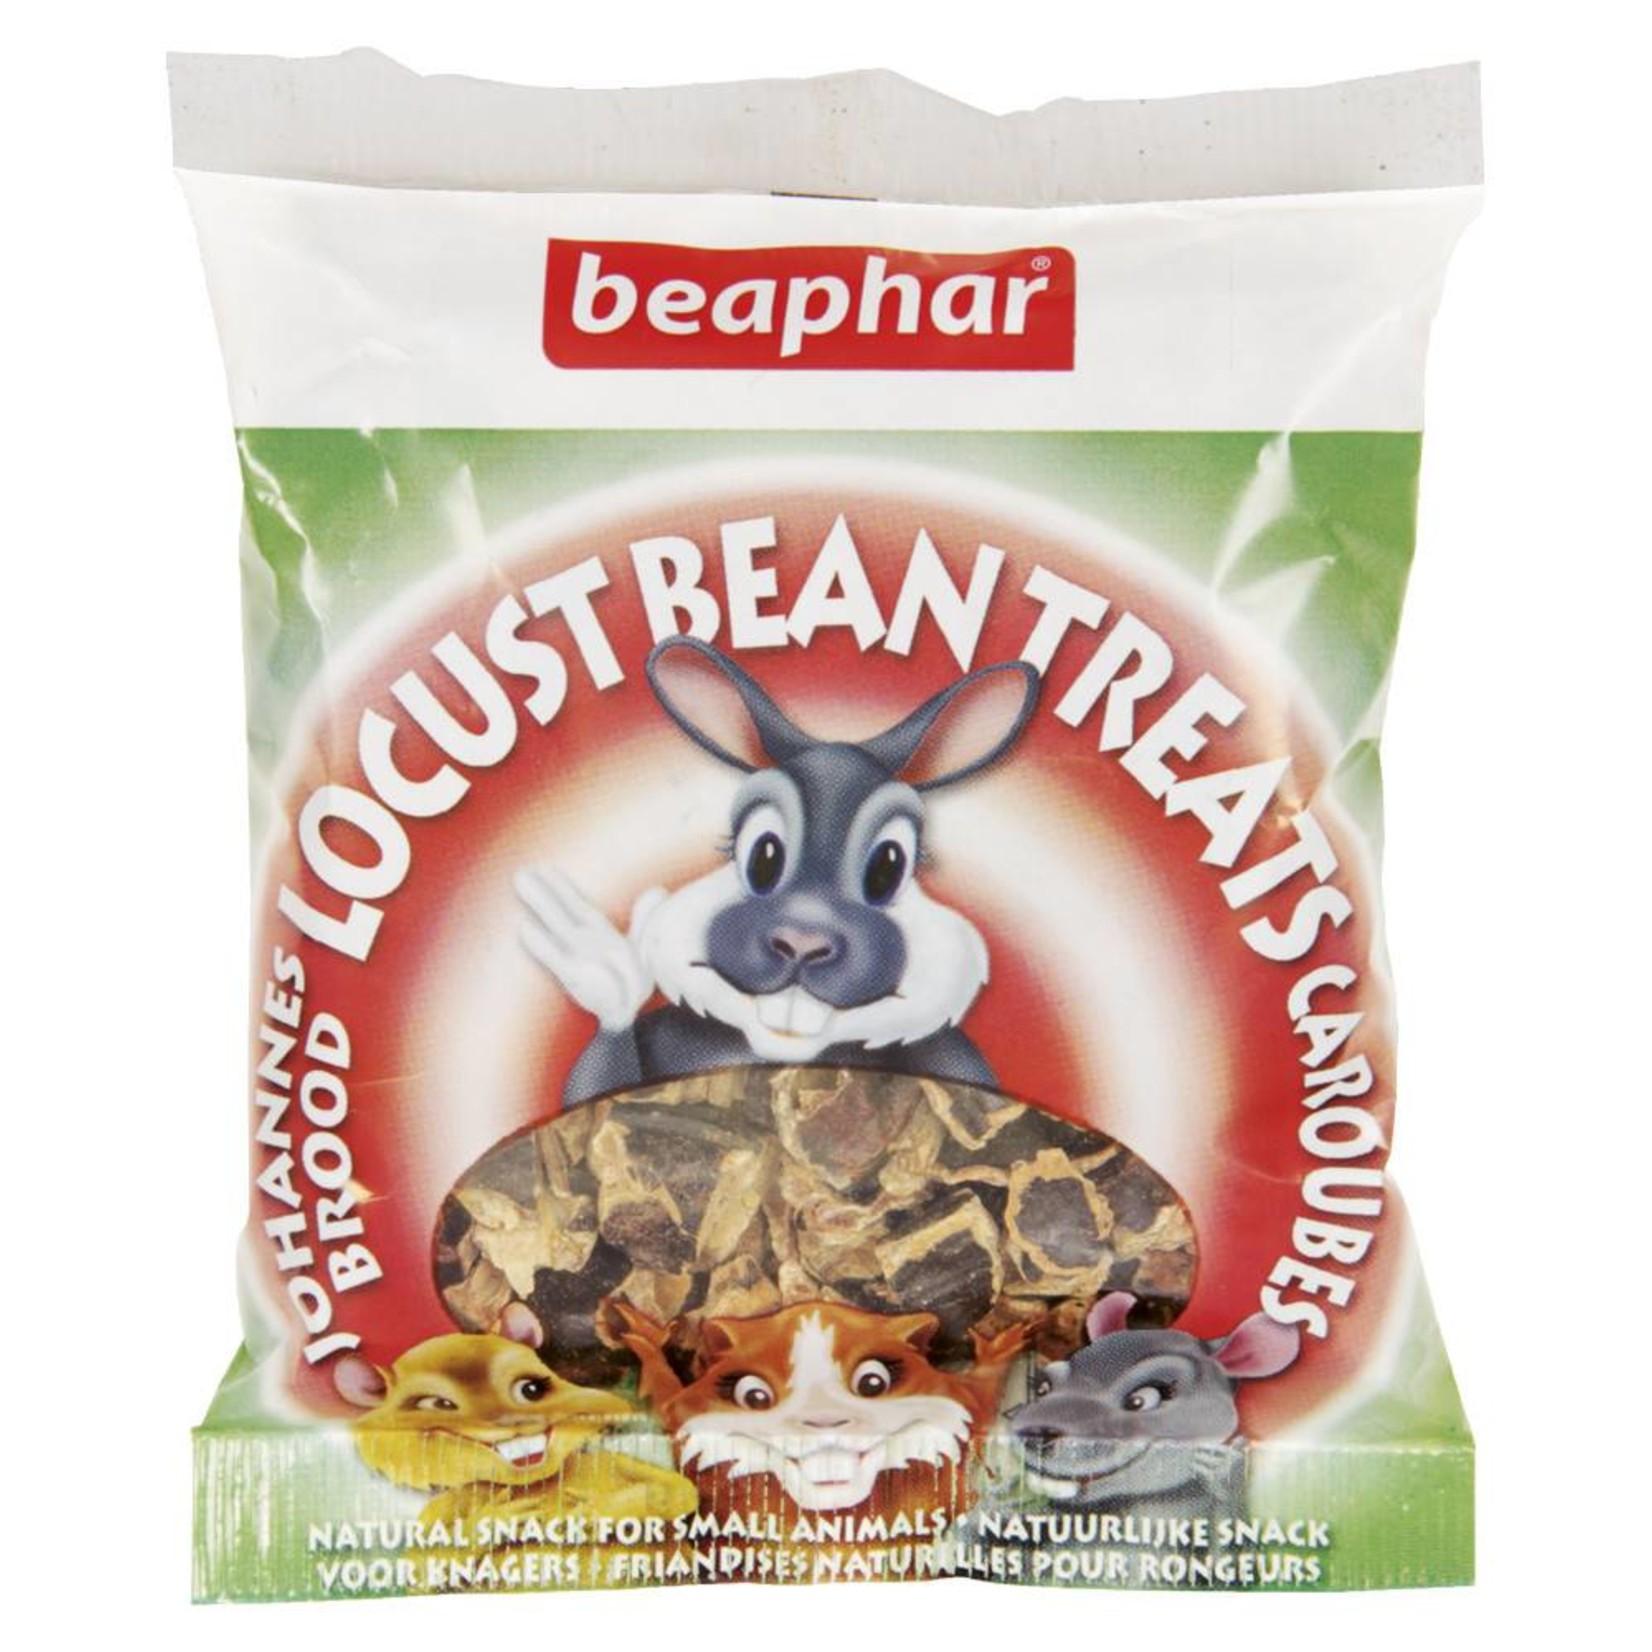 Beaphar Locust Bean Treats for Small Animals, 85g